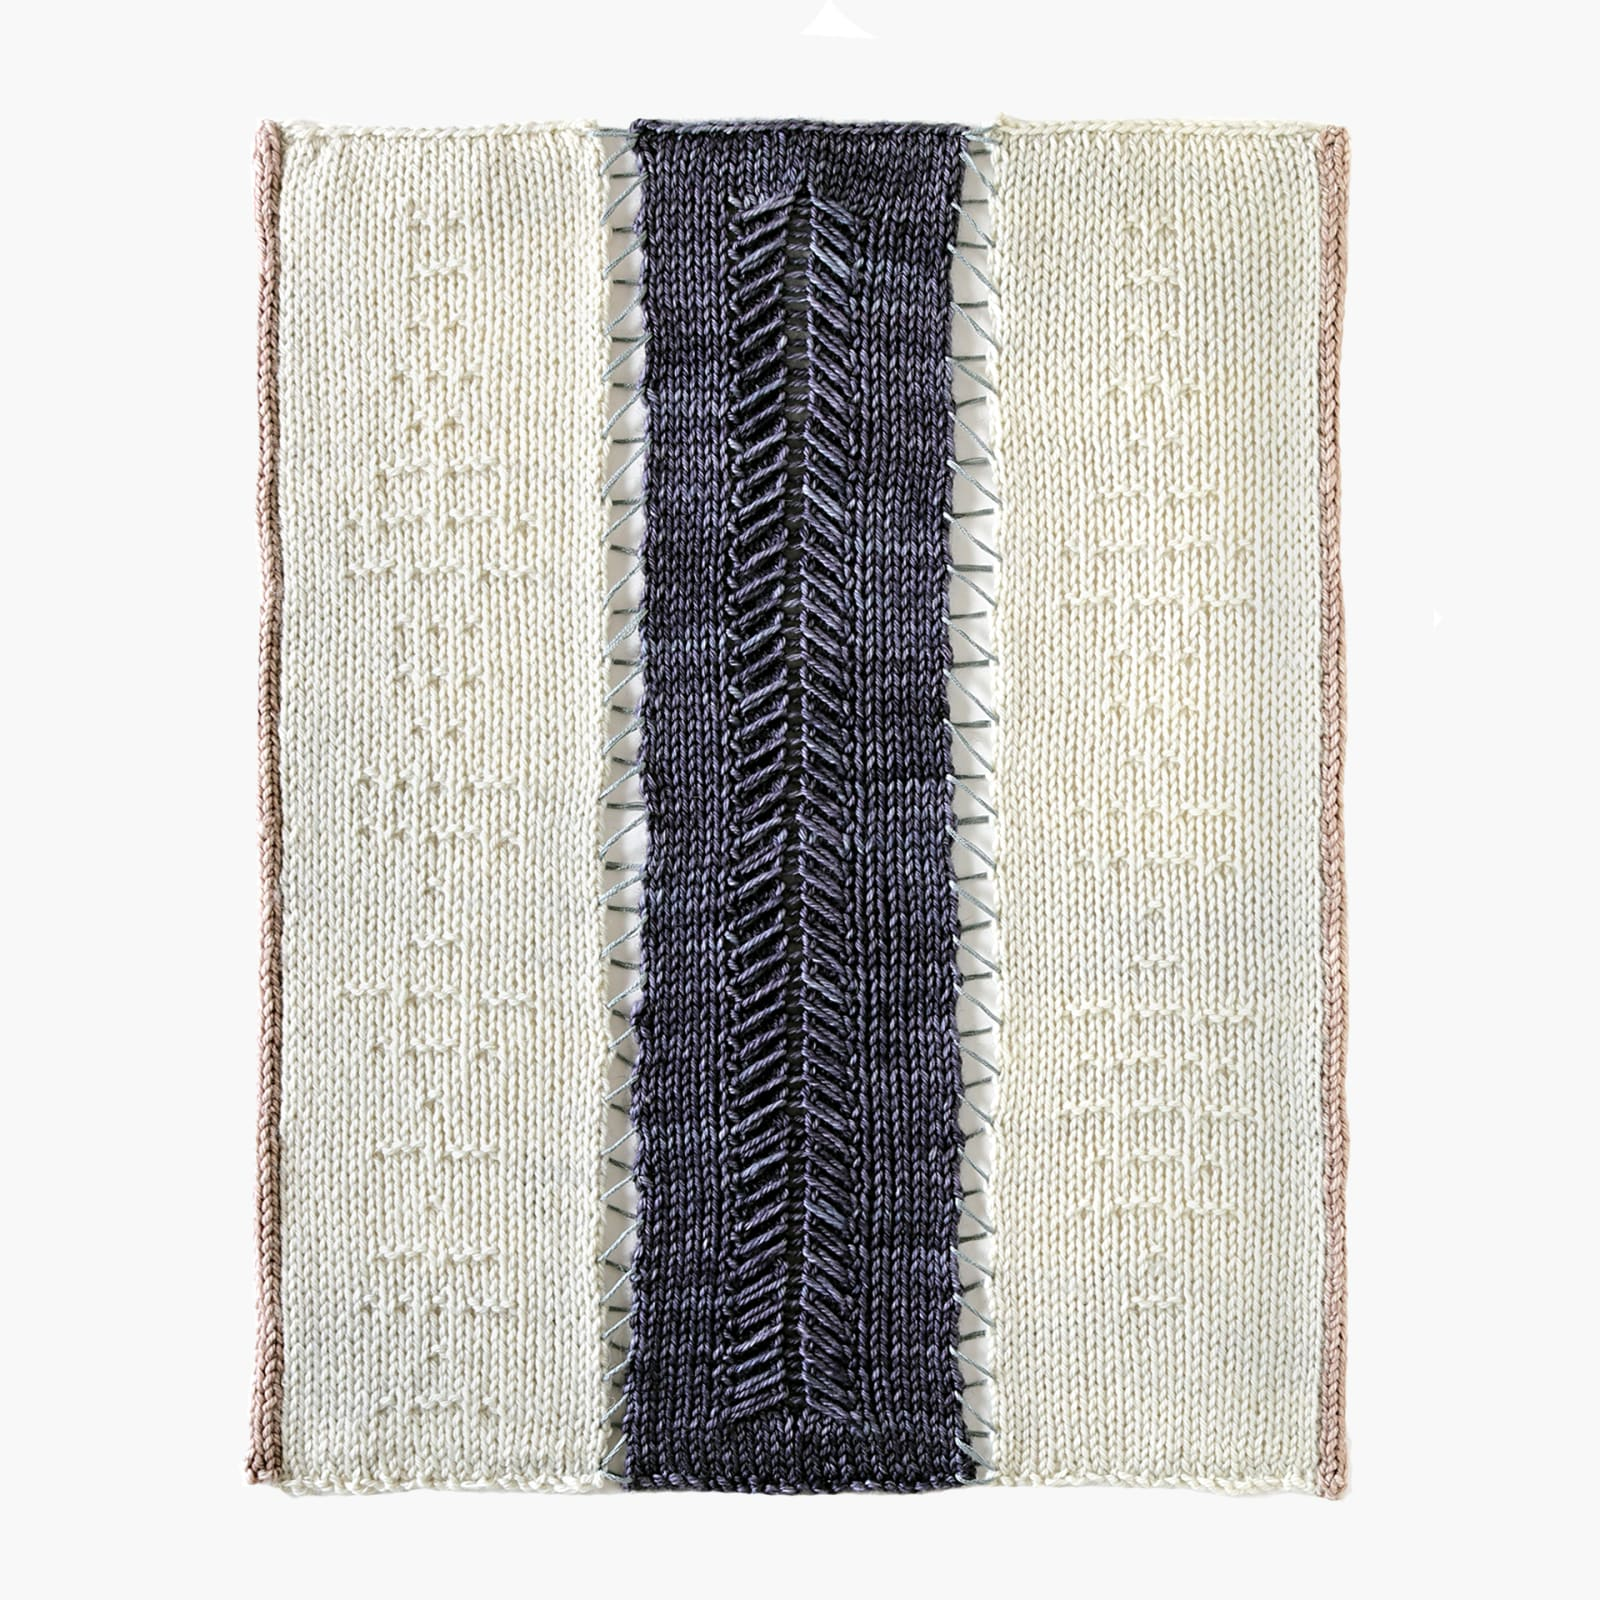 Meghan Udell, Impossible, 2020